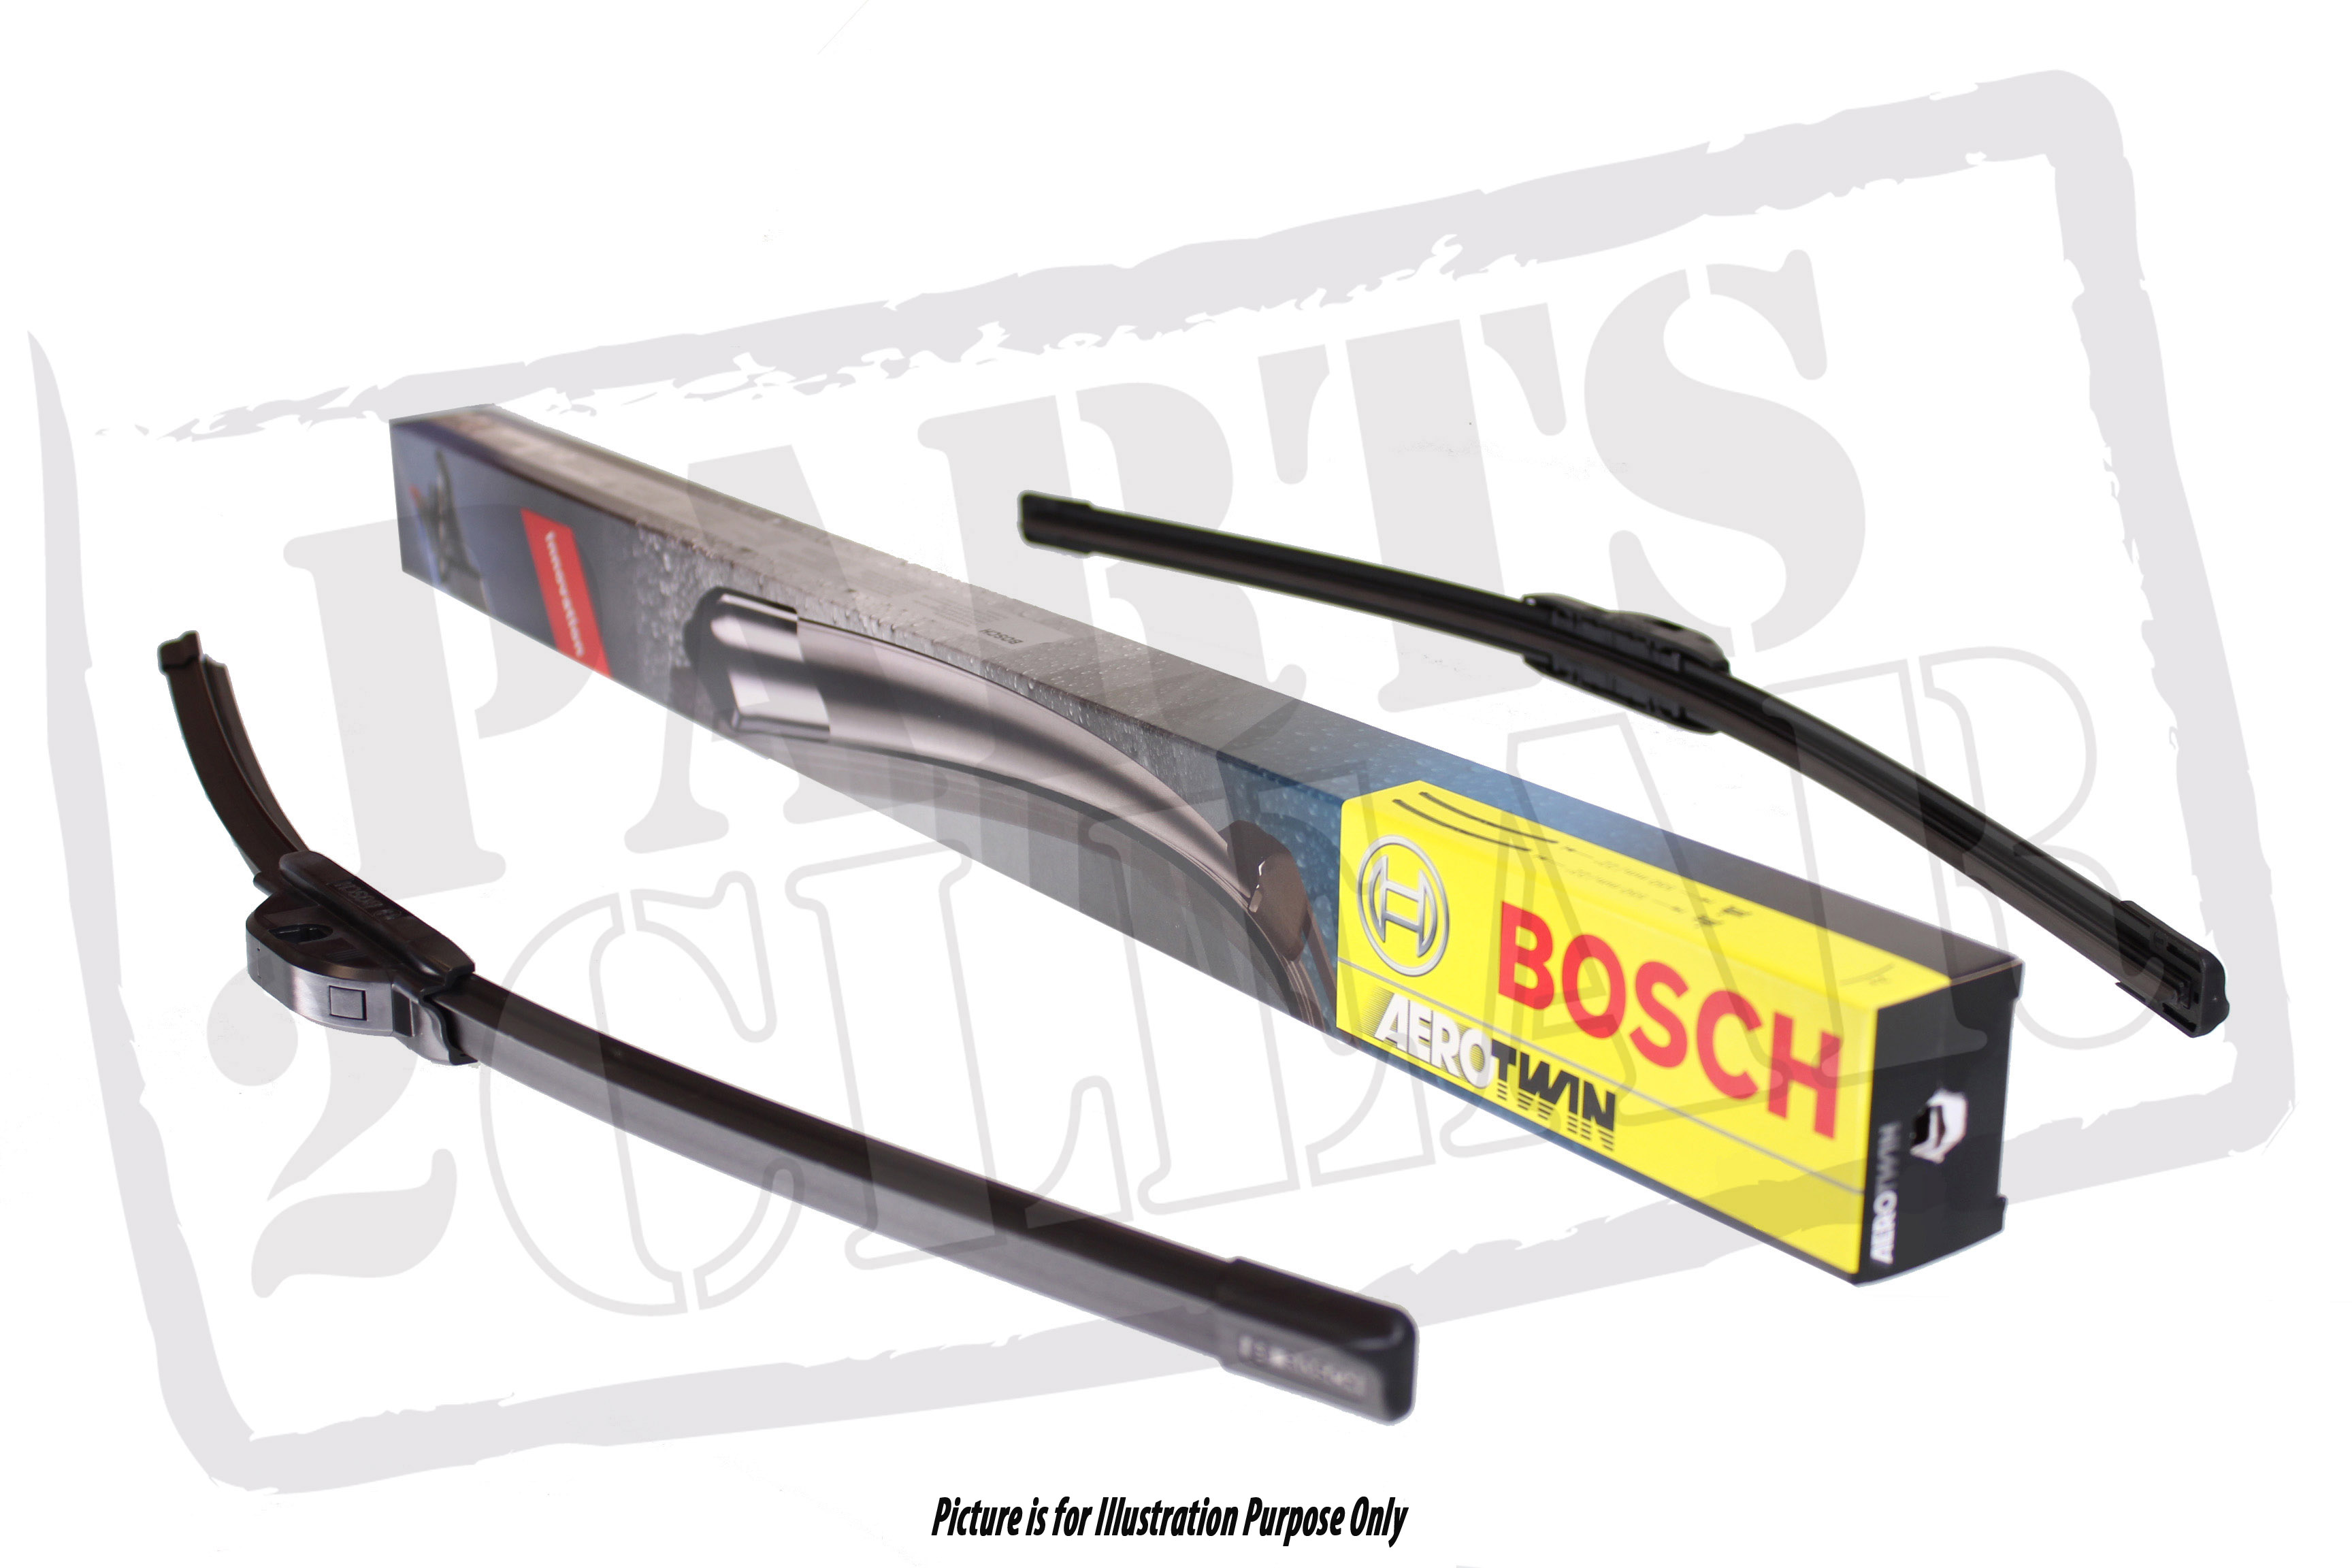 Vauxhall Astra J Front Bosch Aerotwin Flat Wiper Blades Windscreen